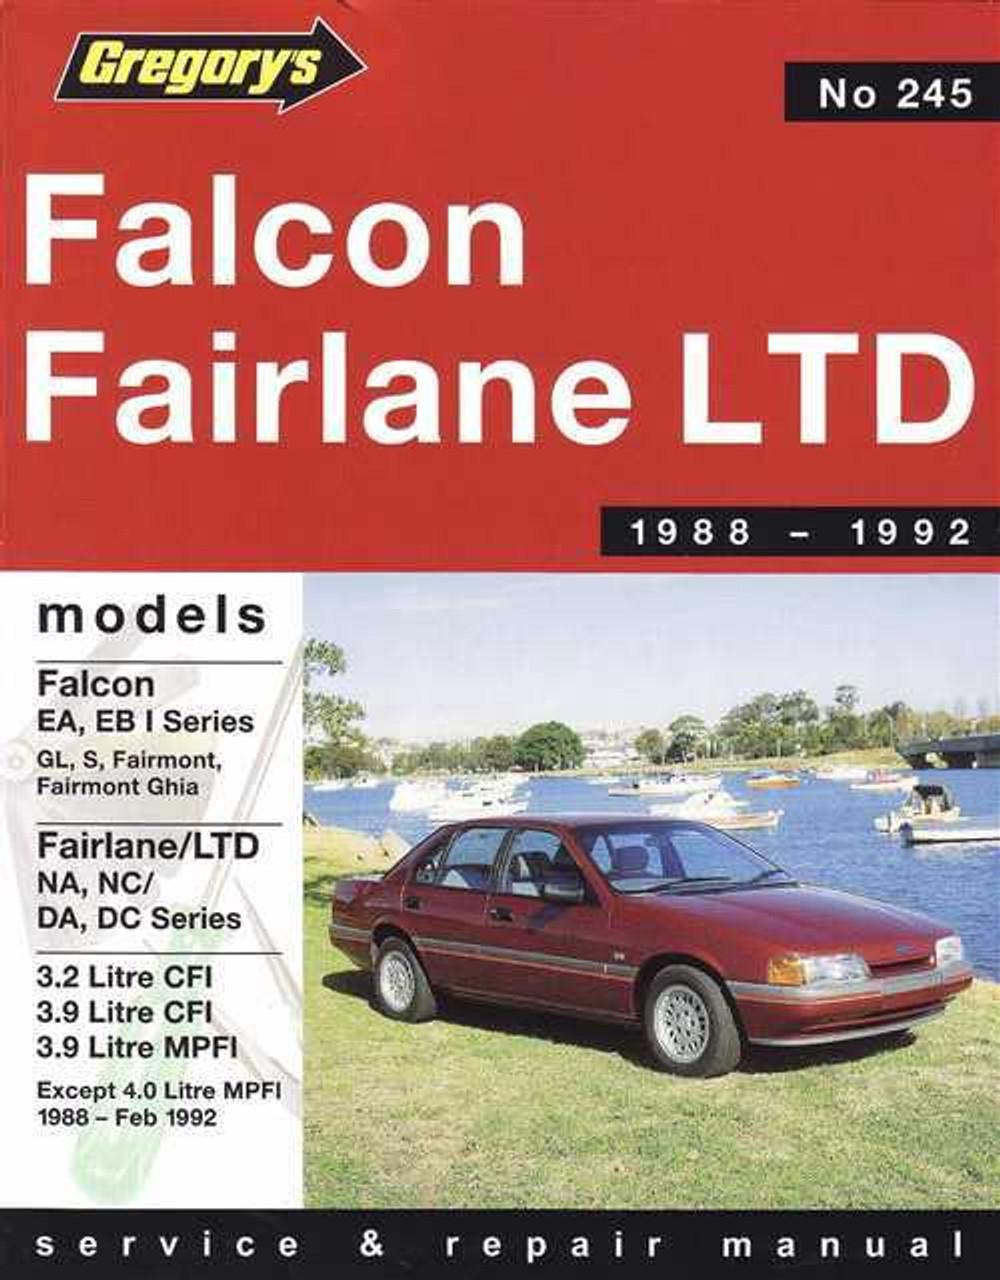 ford falcon fairlane ltd 1988 1992 workshop manual rh automotobookshop com au ford nc fairlane workshop manual ford nc fairlane workshop manual